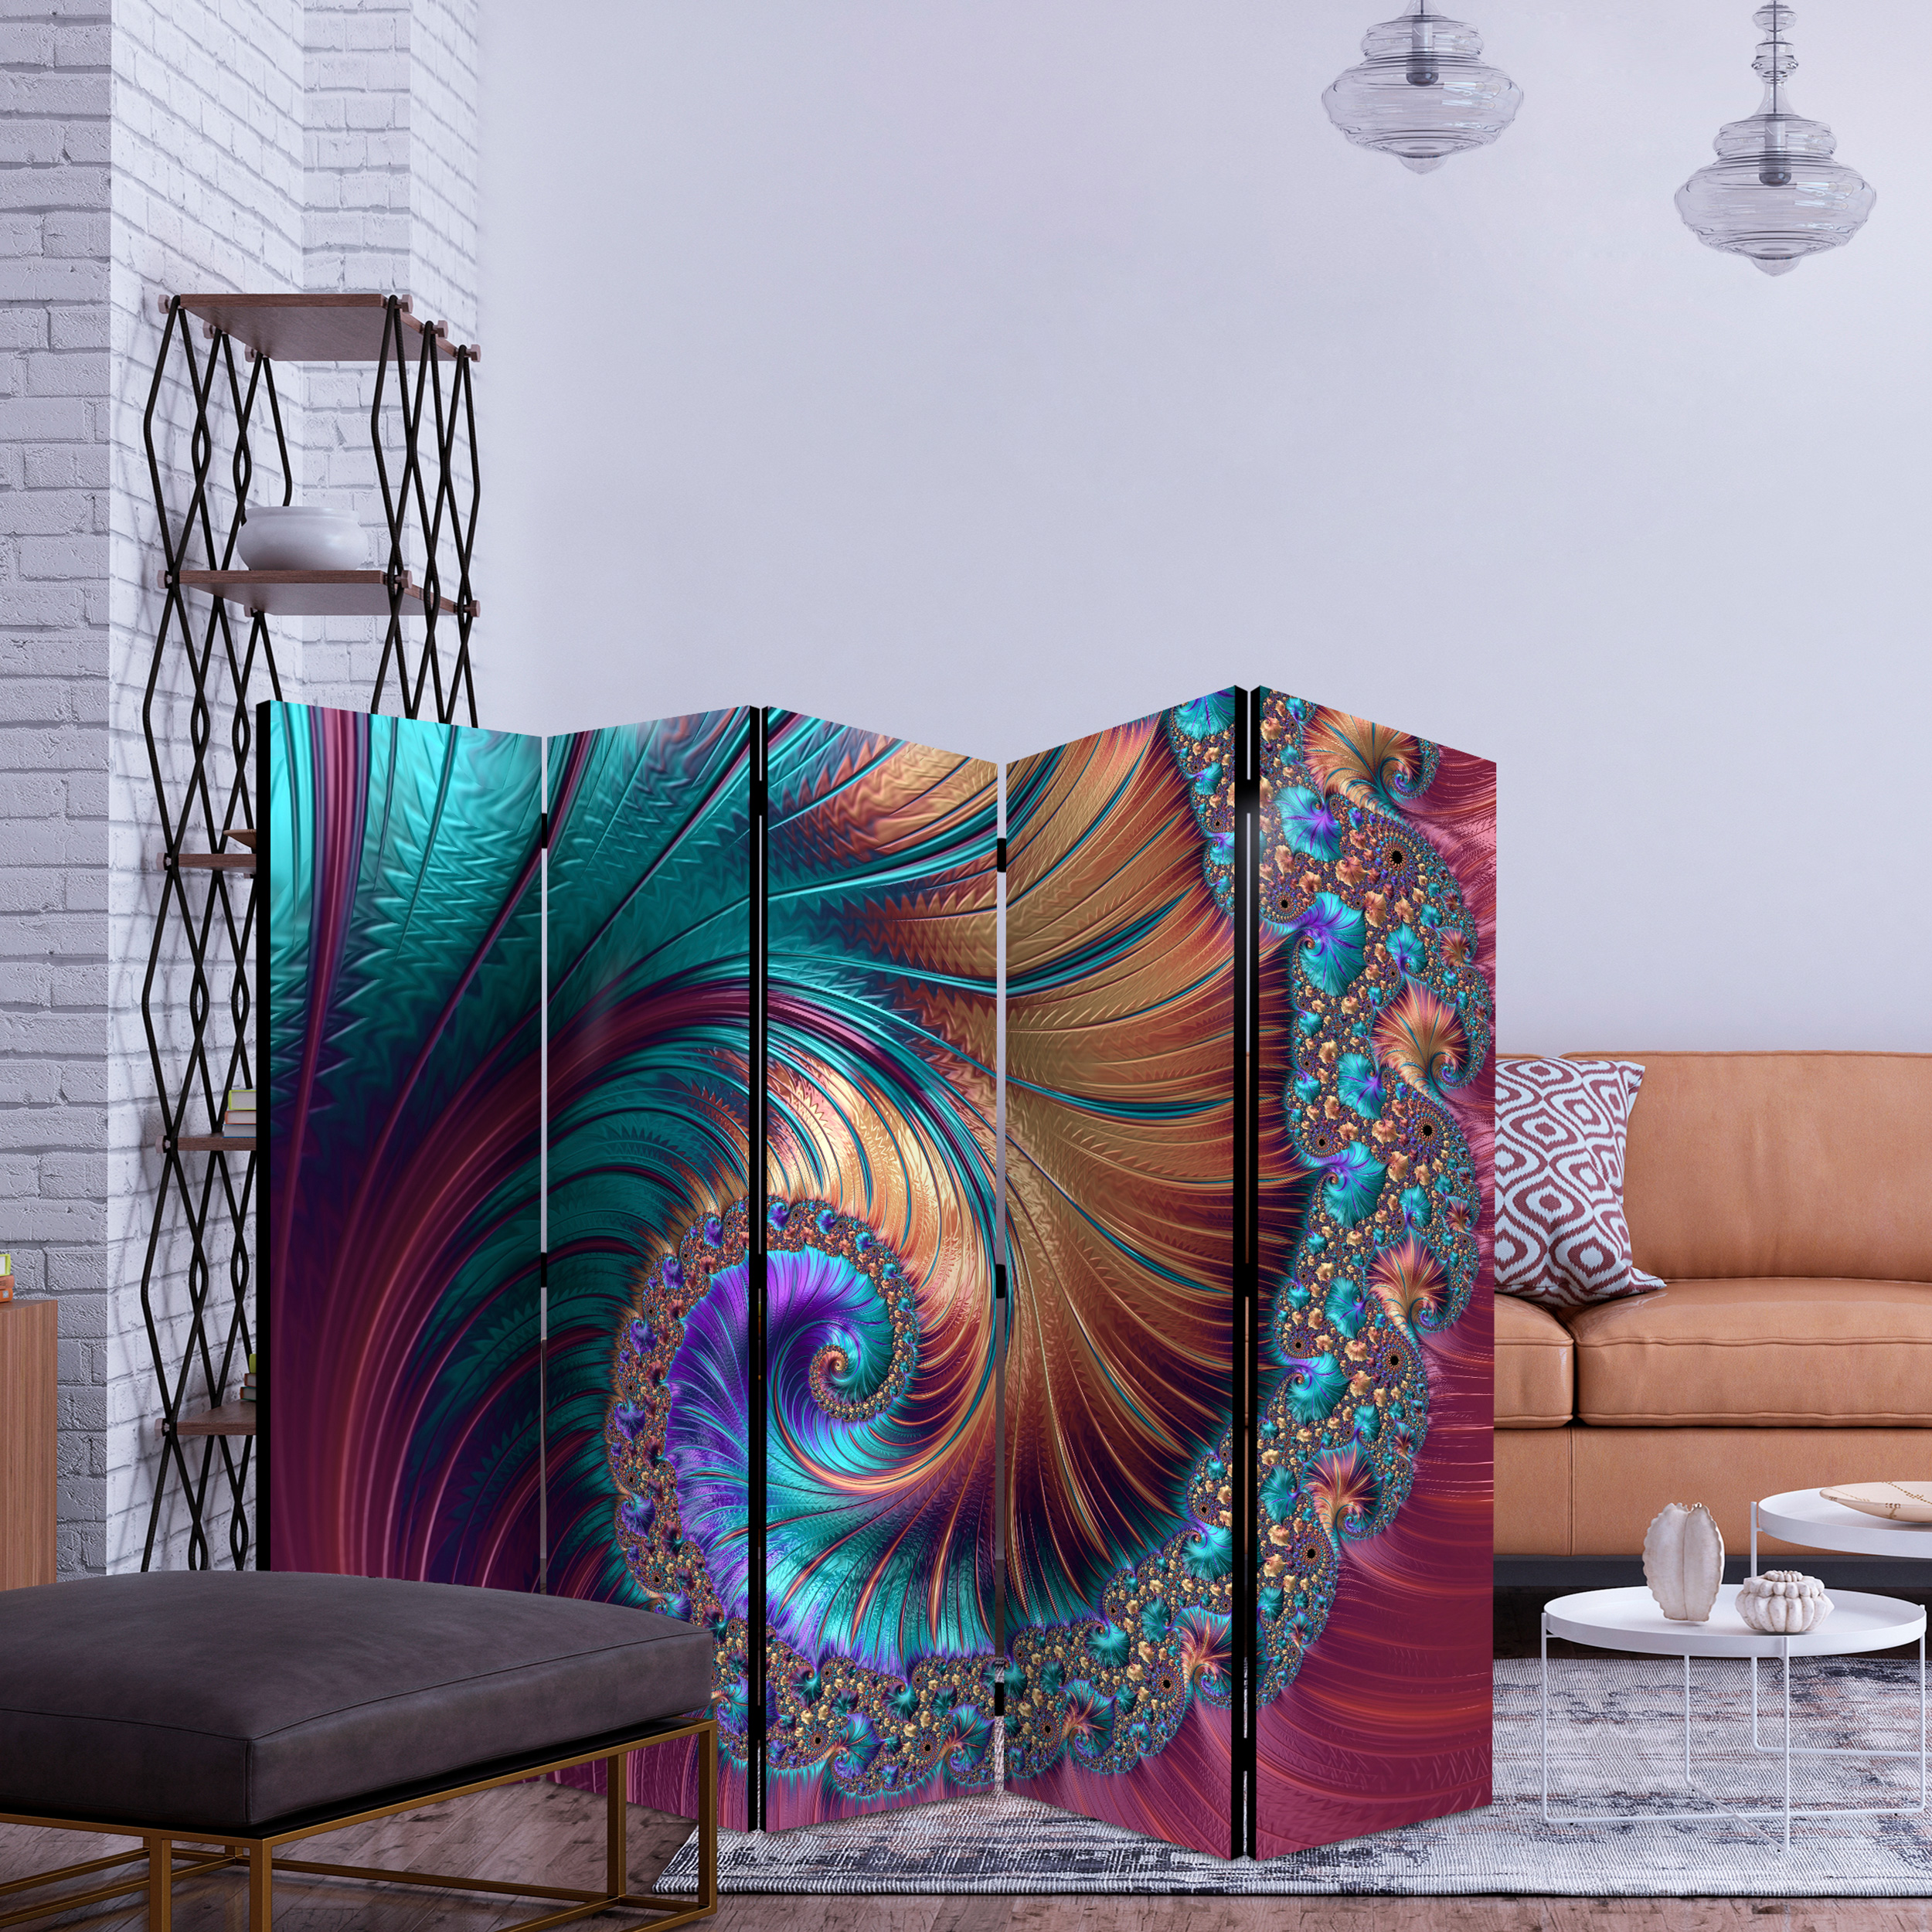 TRENNWAND Spanische PARAVENT RAUMTEILER Wand FOTO 3D Optik Bunt Design 5 Motiv